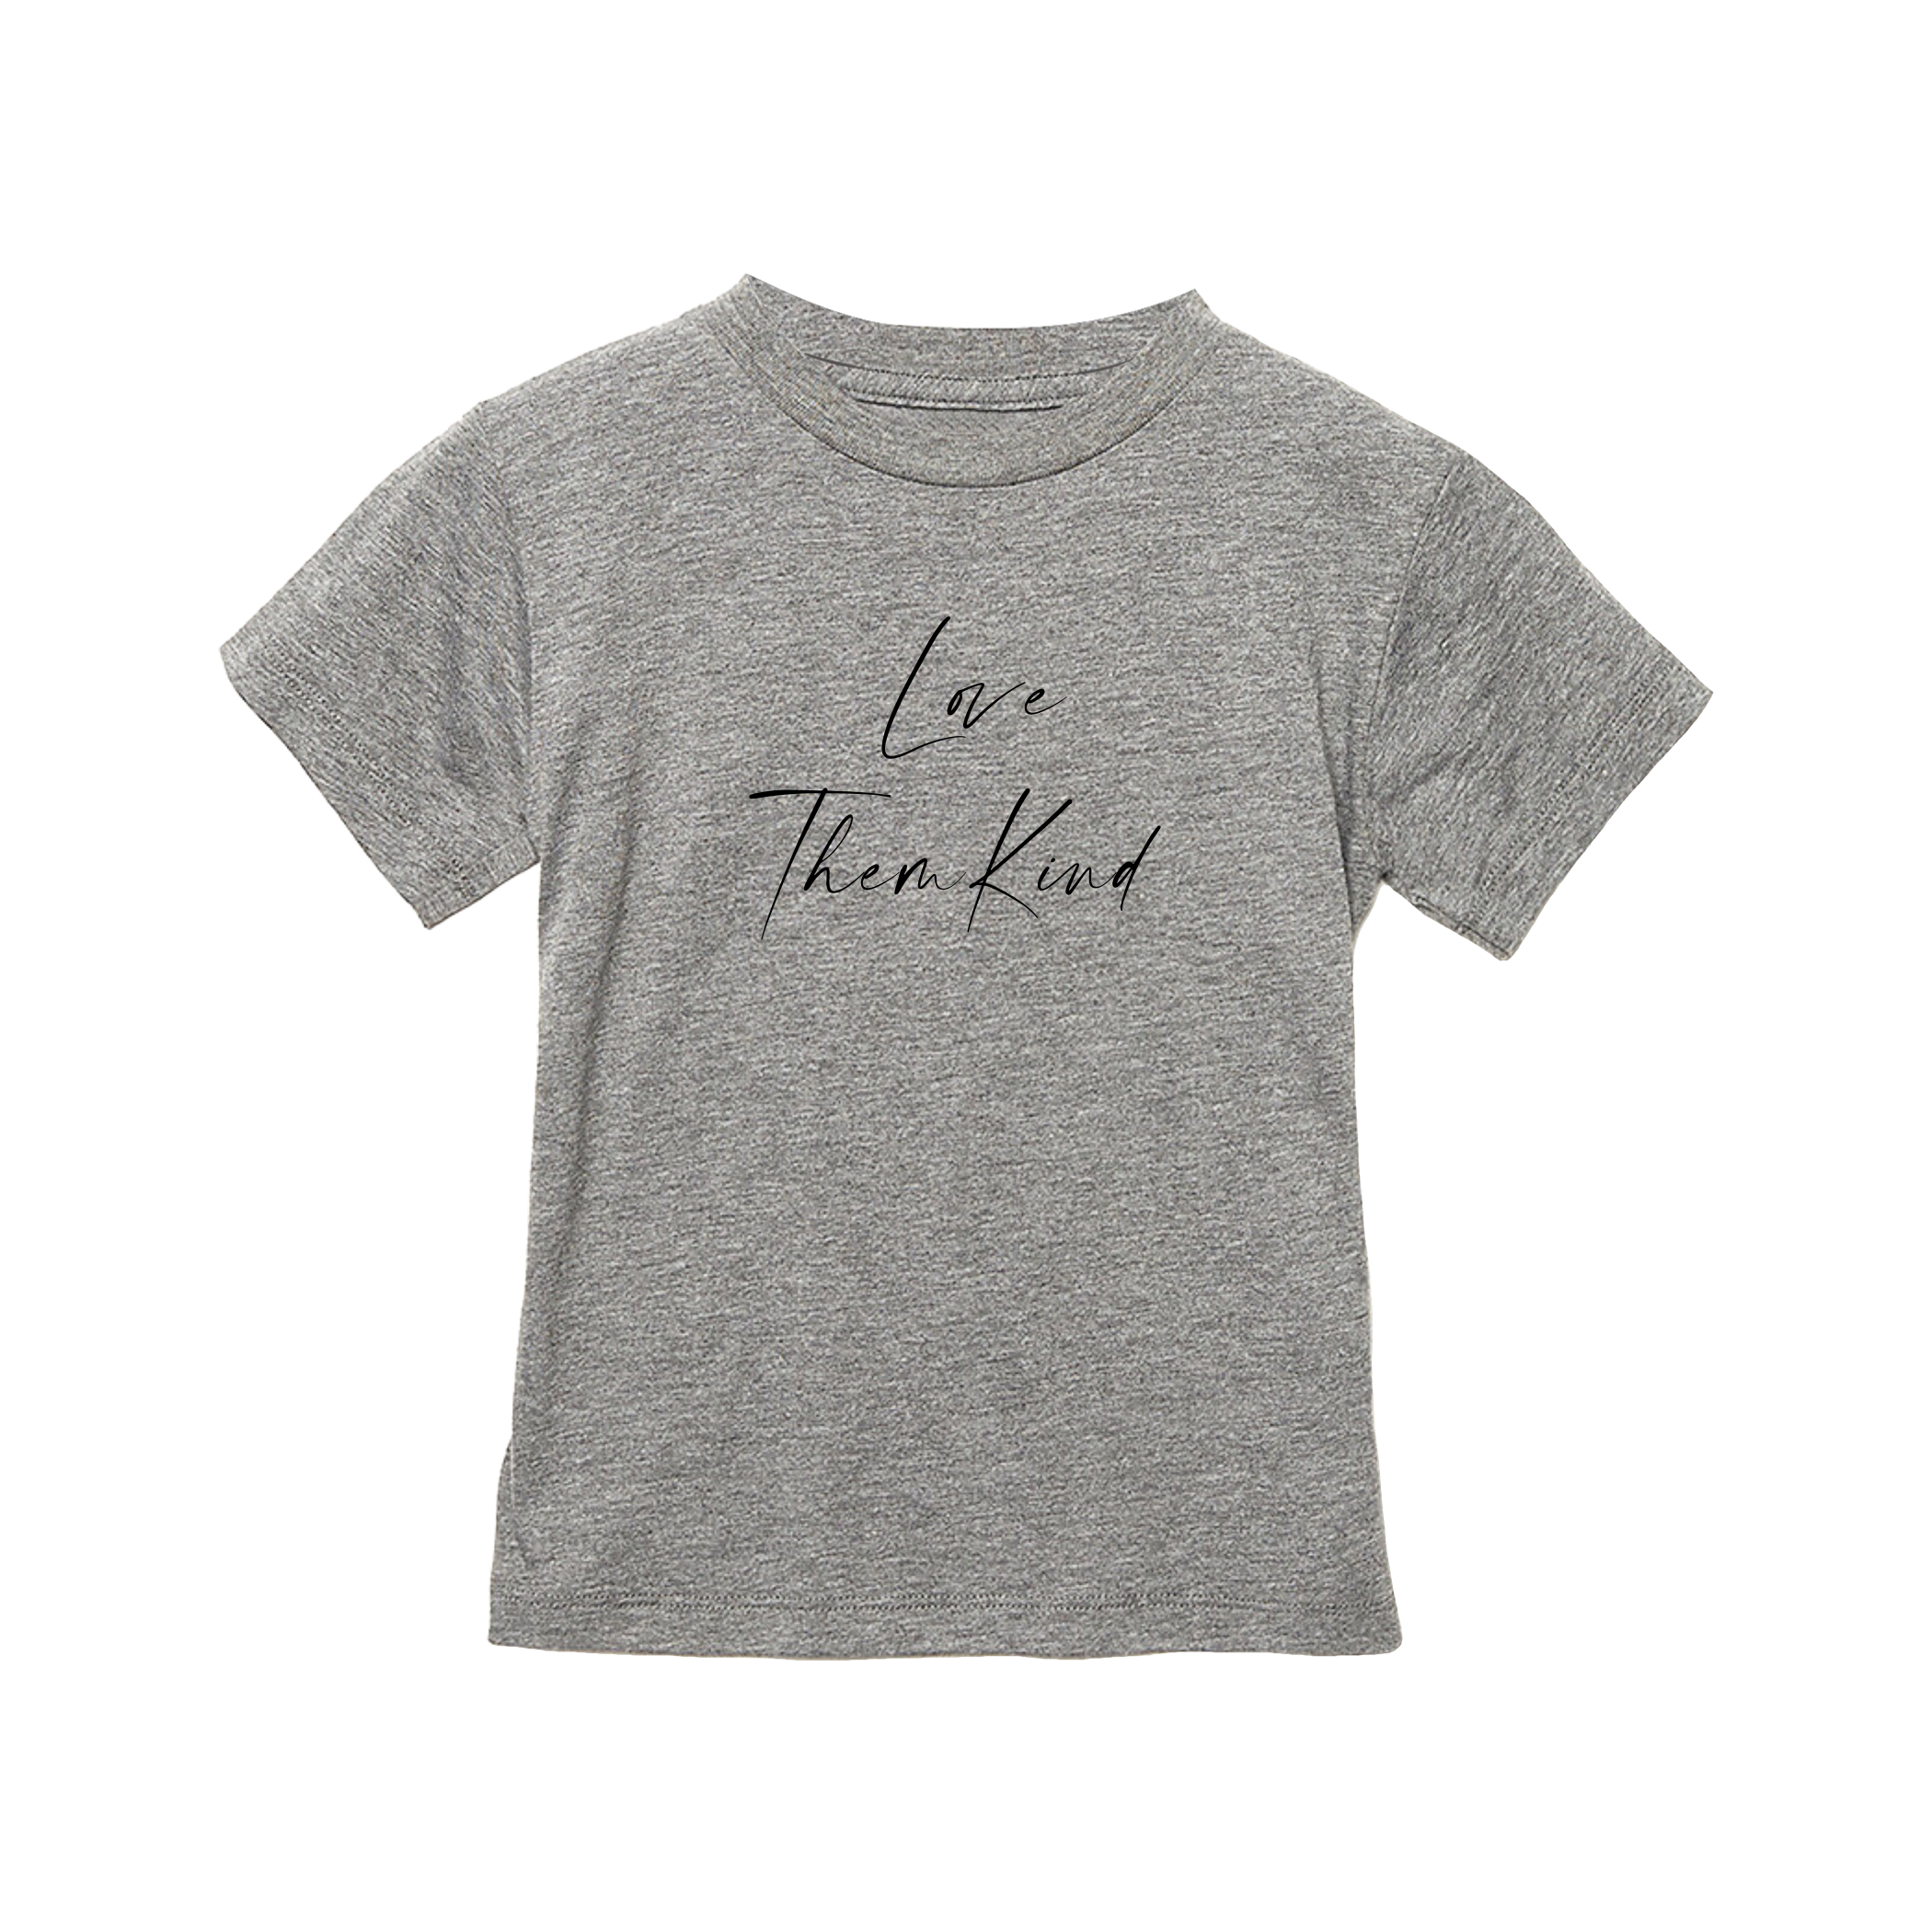 Love Them Kind Tee | Trada Marketplace